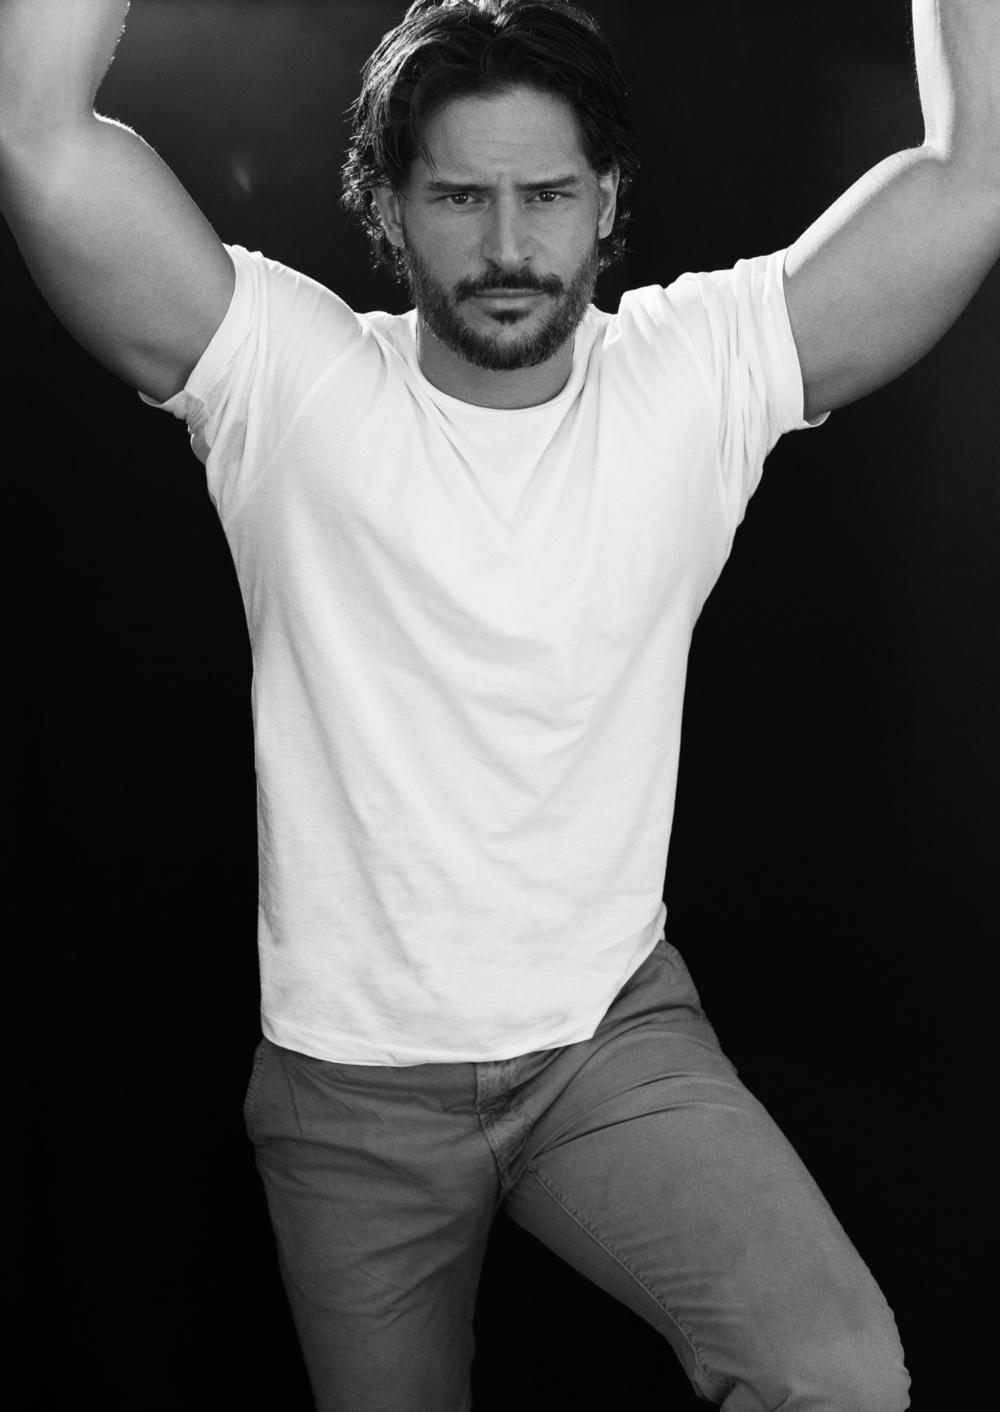 Joe Manganiello Named Hot Body of 2012… and Fictional Boyfriend of the Year! (PHOTOS)